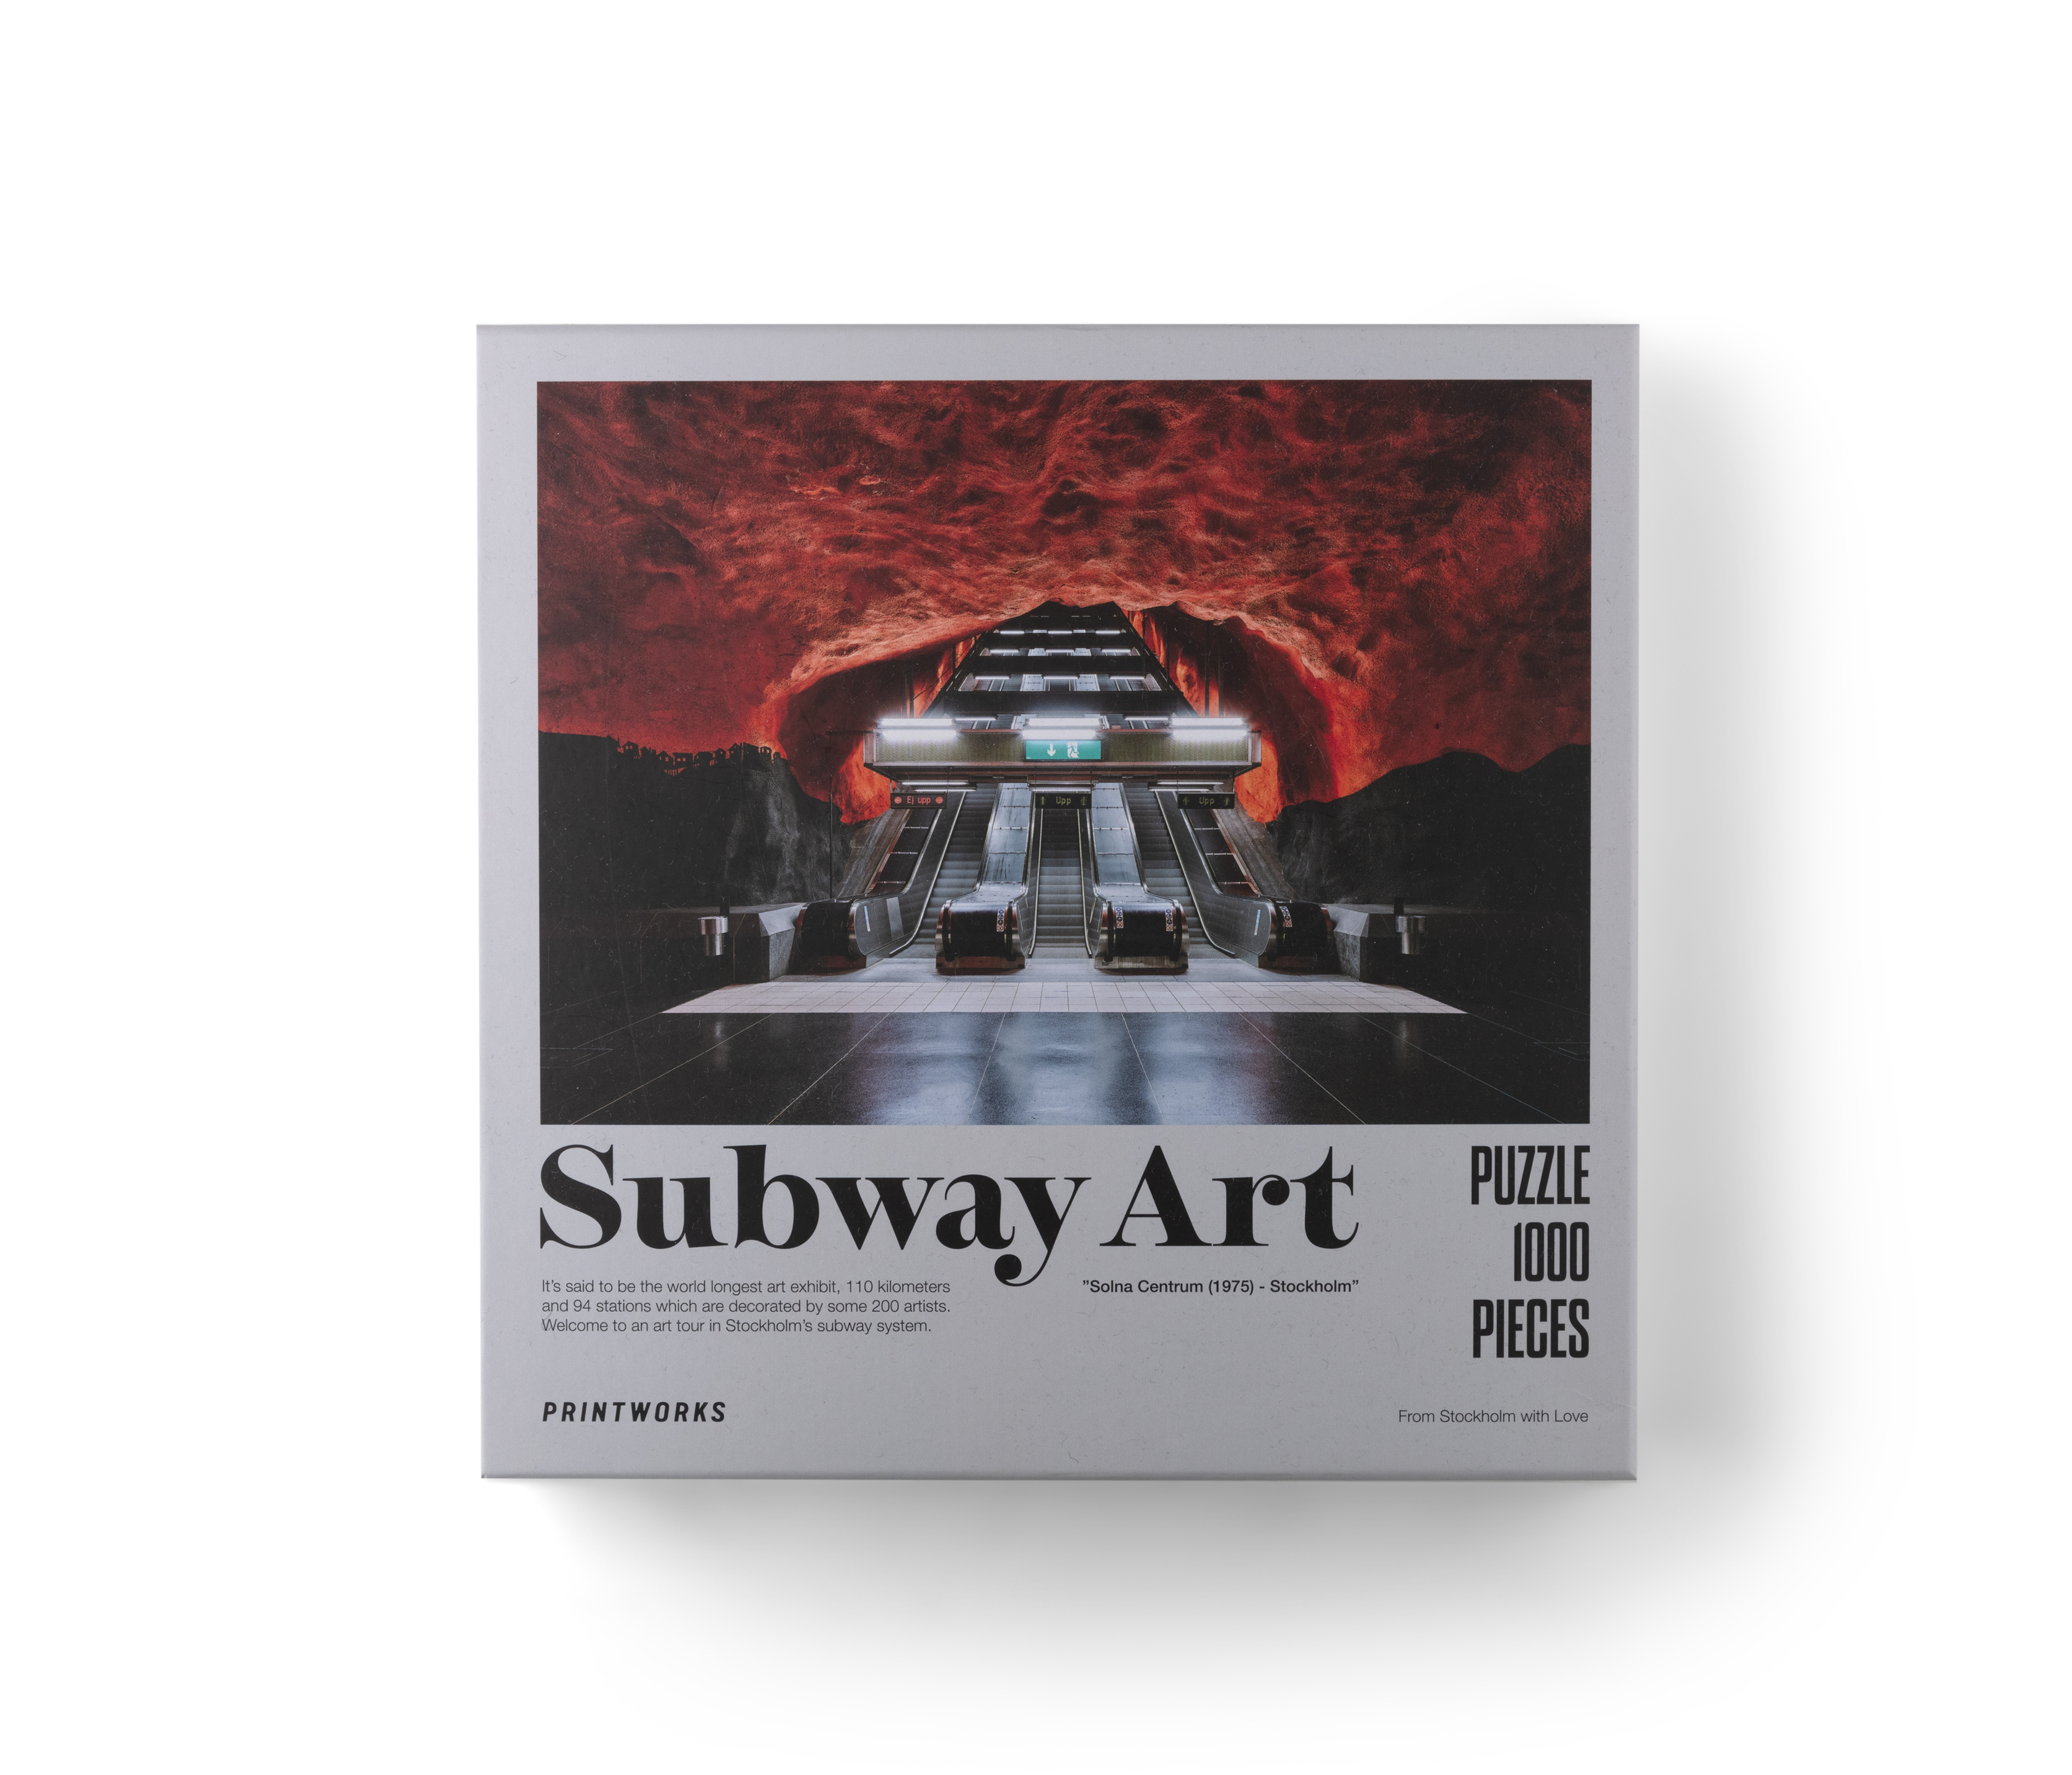 Puzzle Subway Art Fire